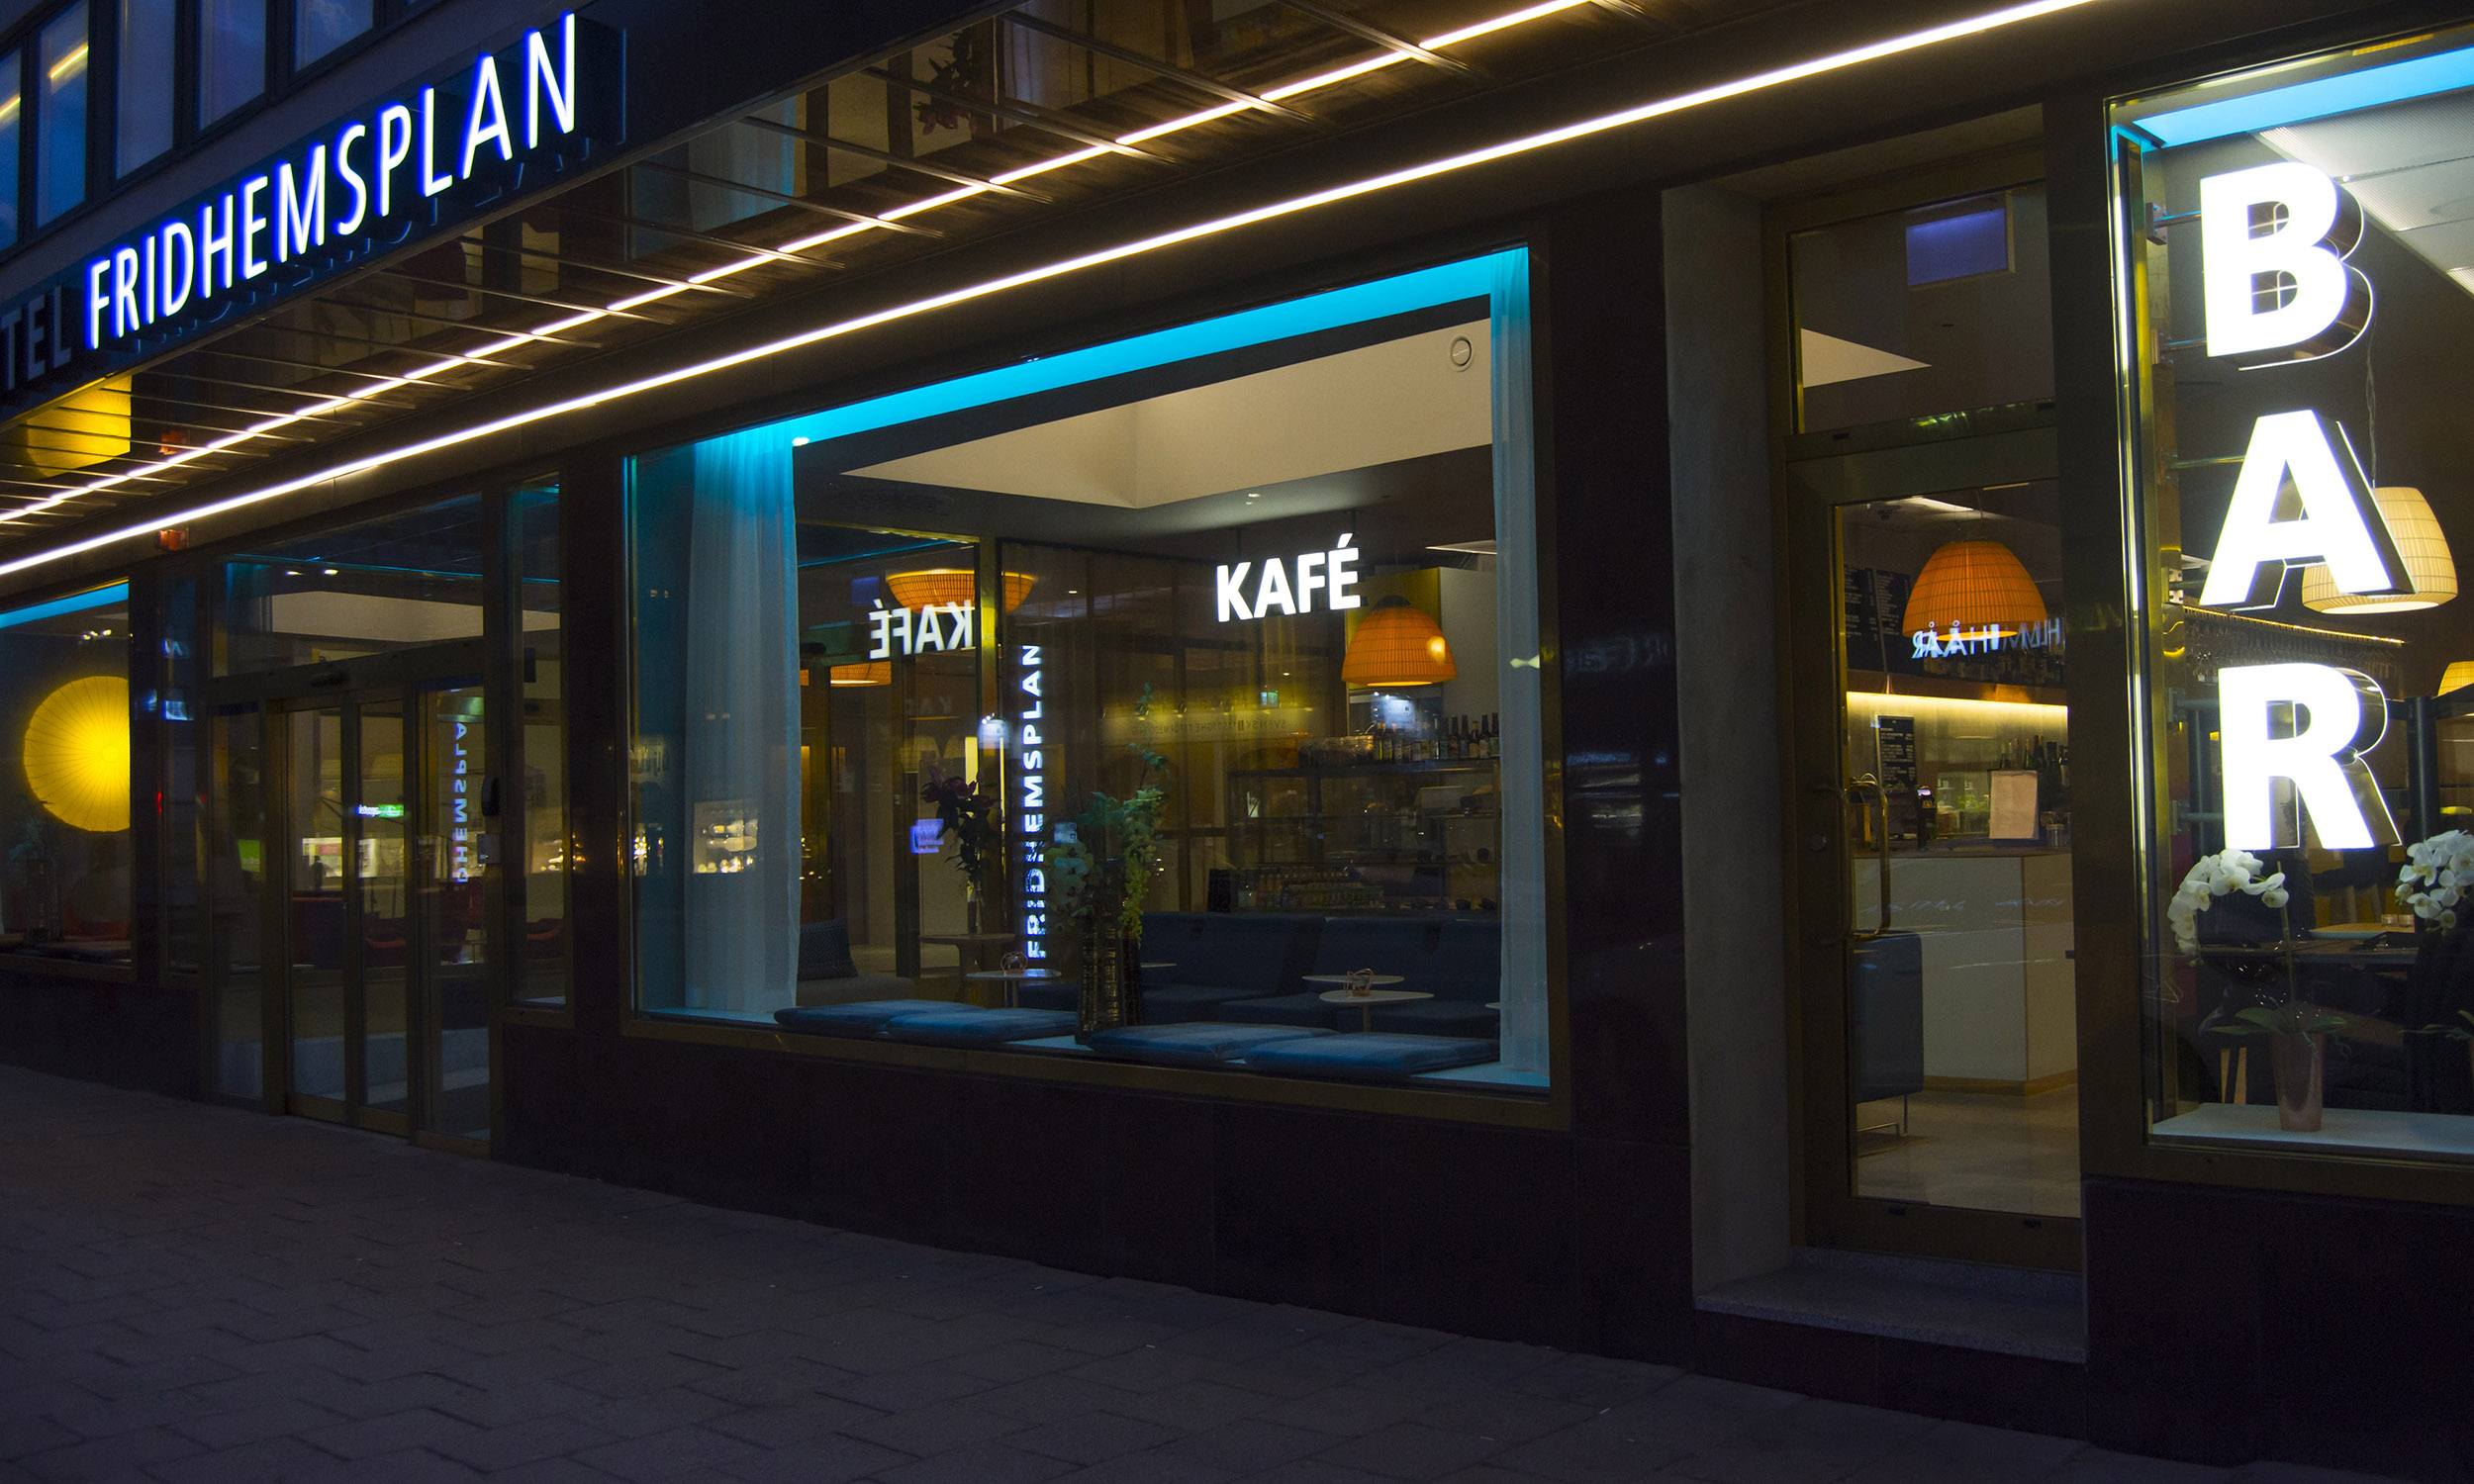 Stockholm_Night_Kungsholmen_First_Hotel_